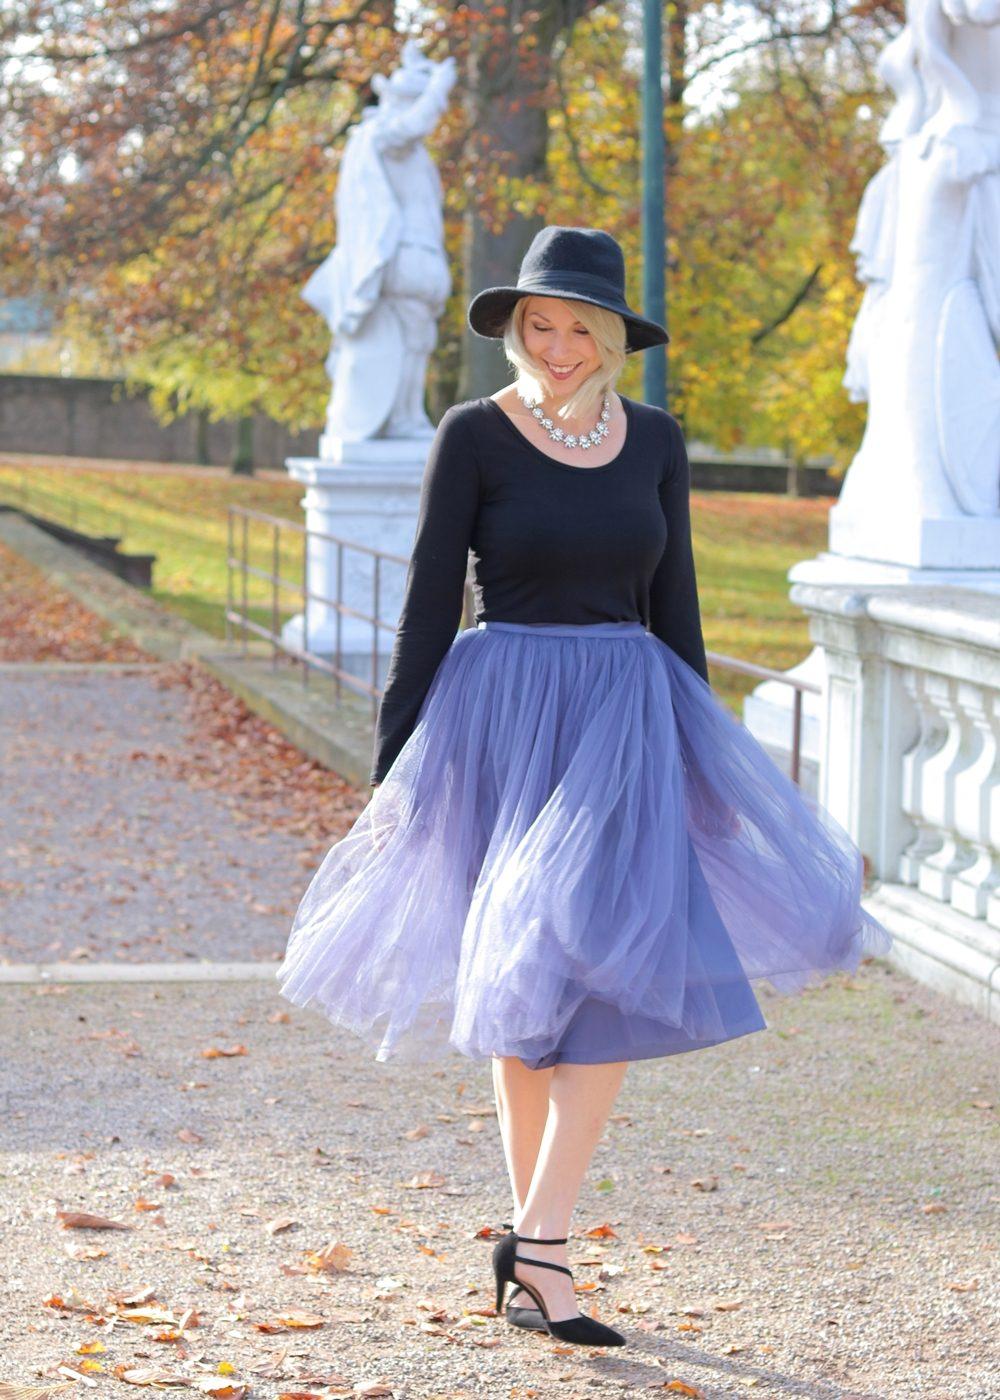 fashionblogger-karlsruhe-outfit-lila-tuellrock-asos-shirt-pumps-tamaris-schwarzer-hut-6